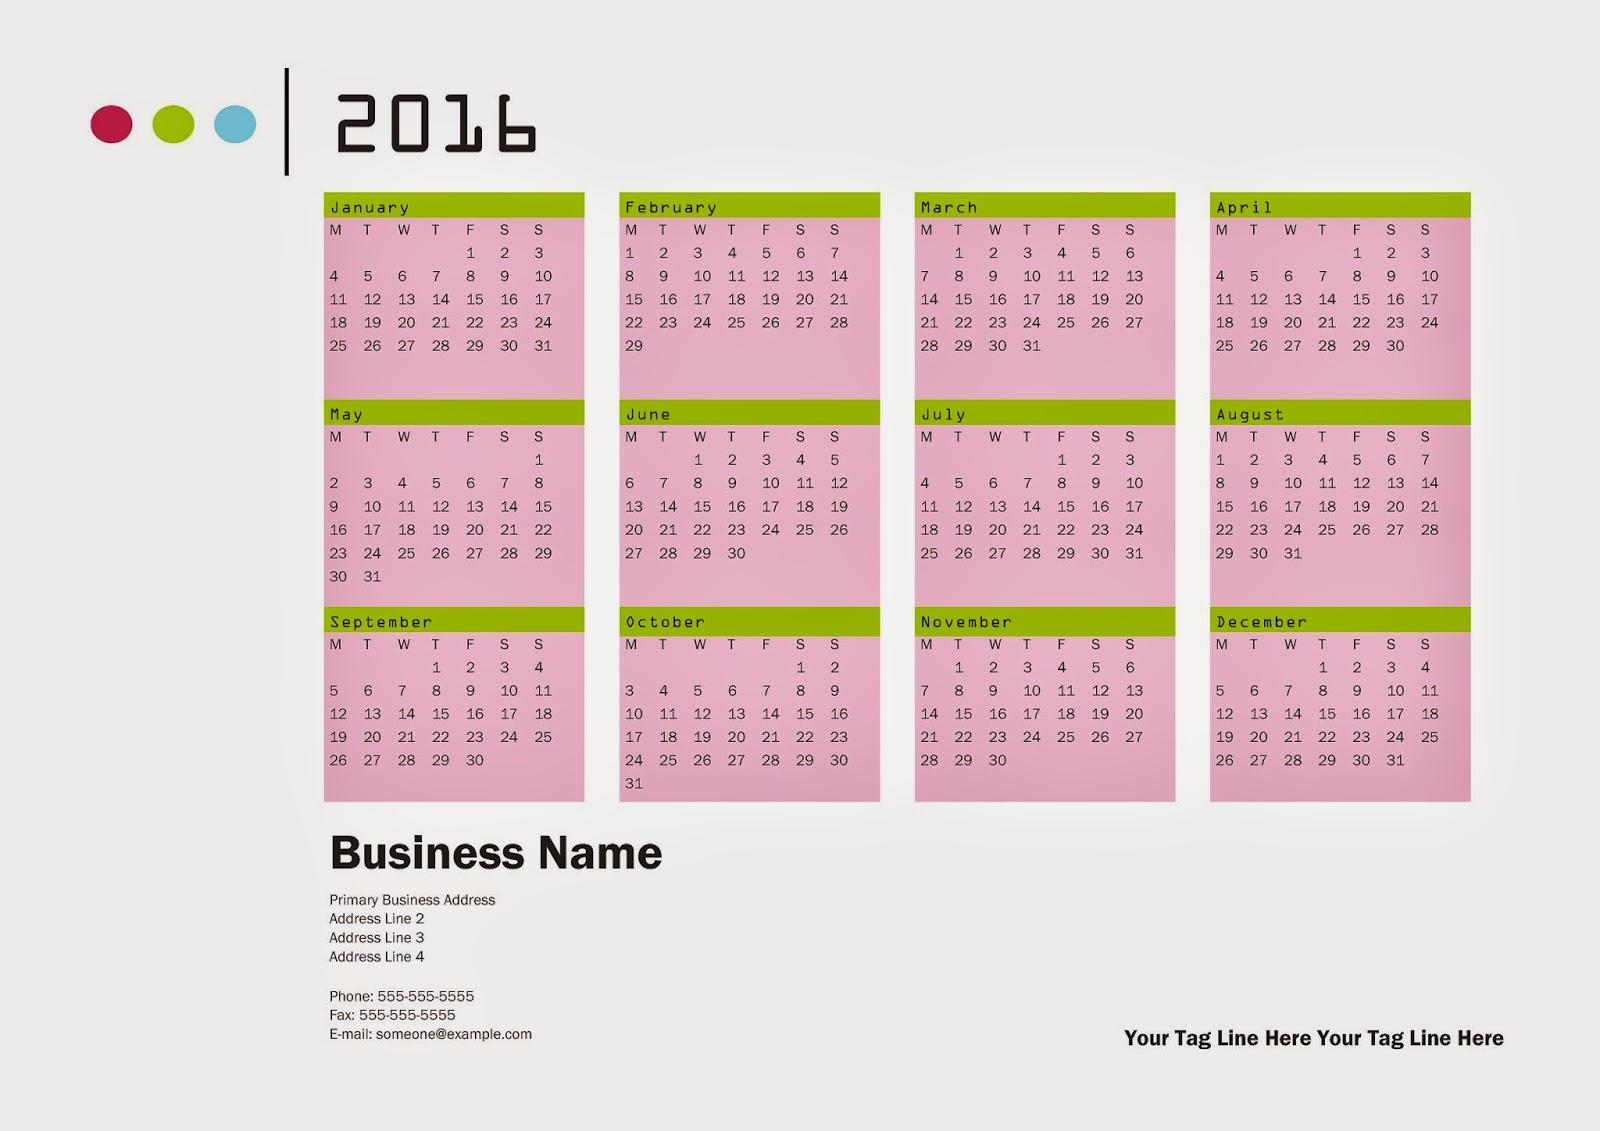 Happy New Year 2016: Calendar 2016 - Free Download Vector PDF JPG ...